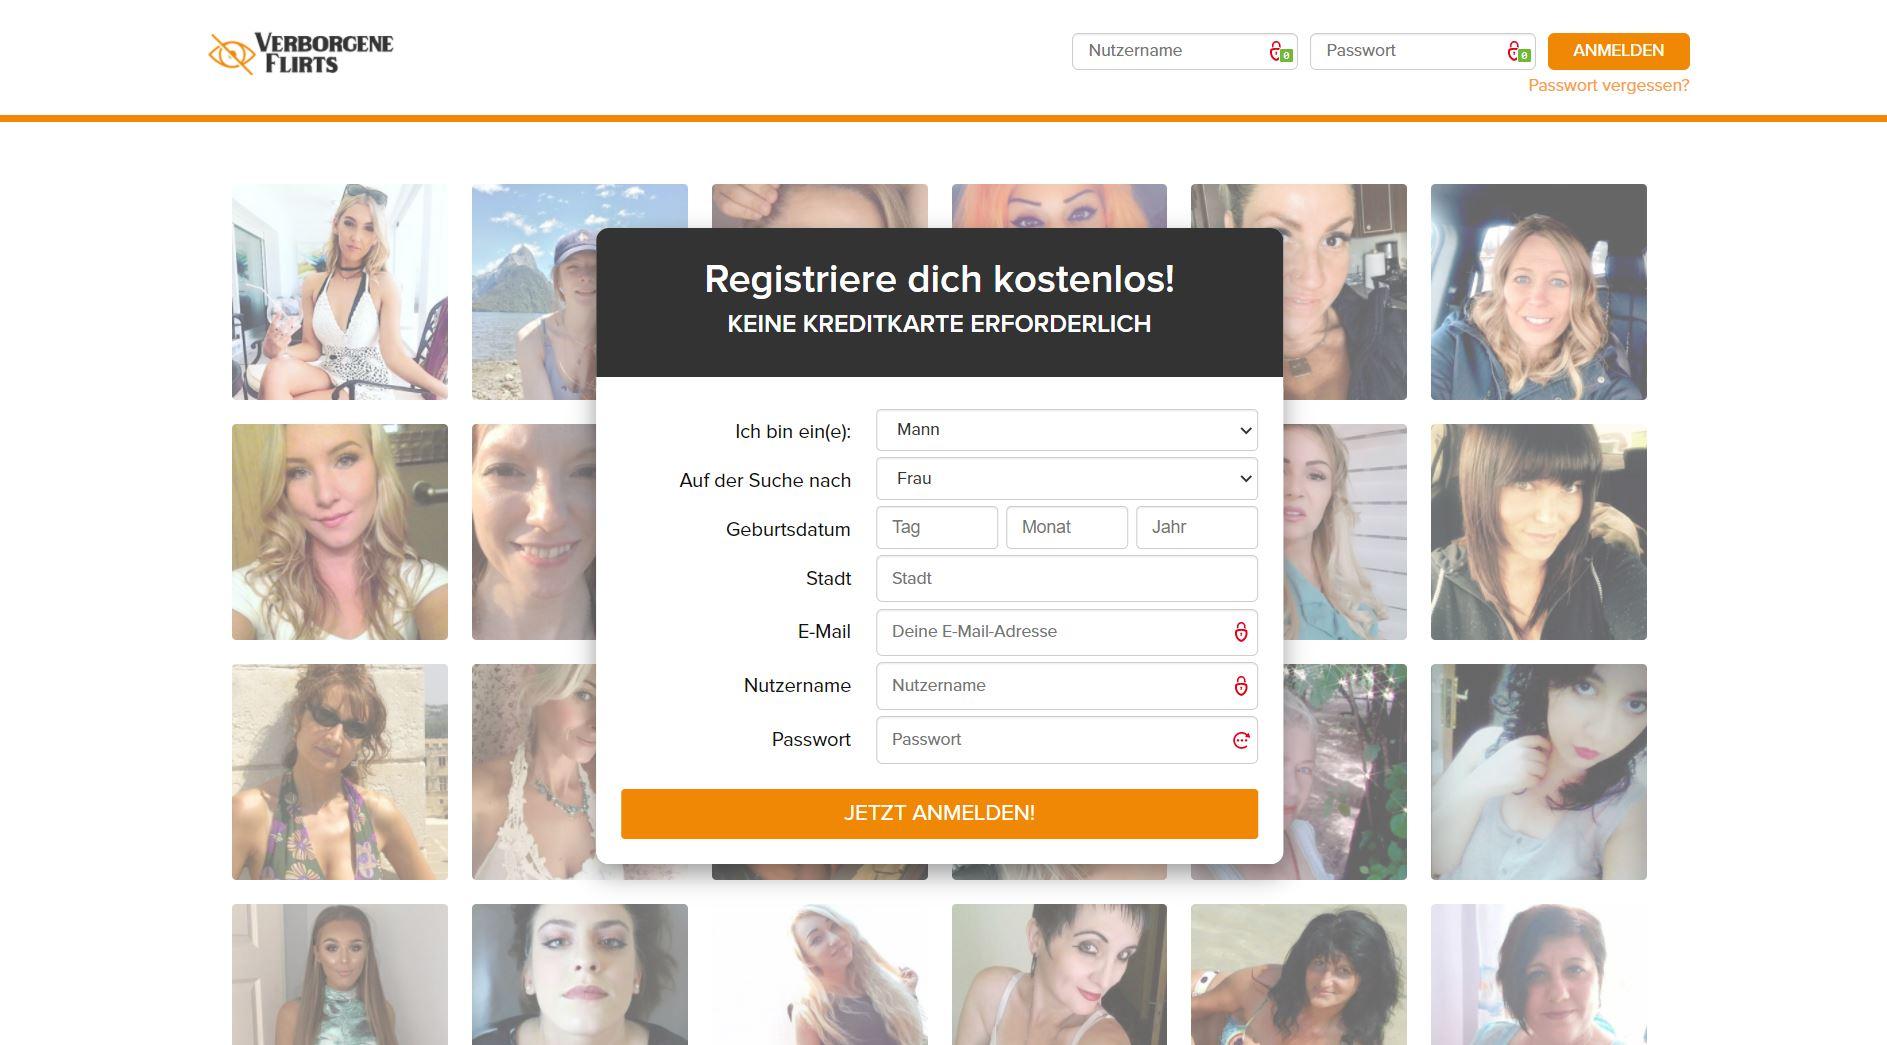 Testbericht - verborgeneflirts.com Abzocke